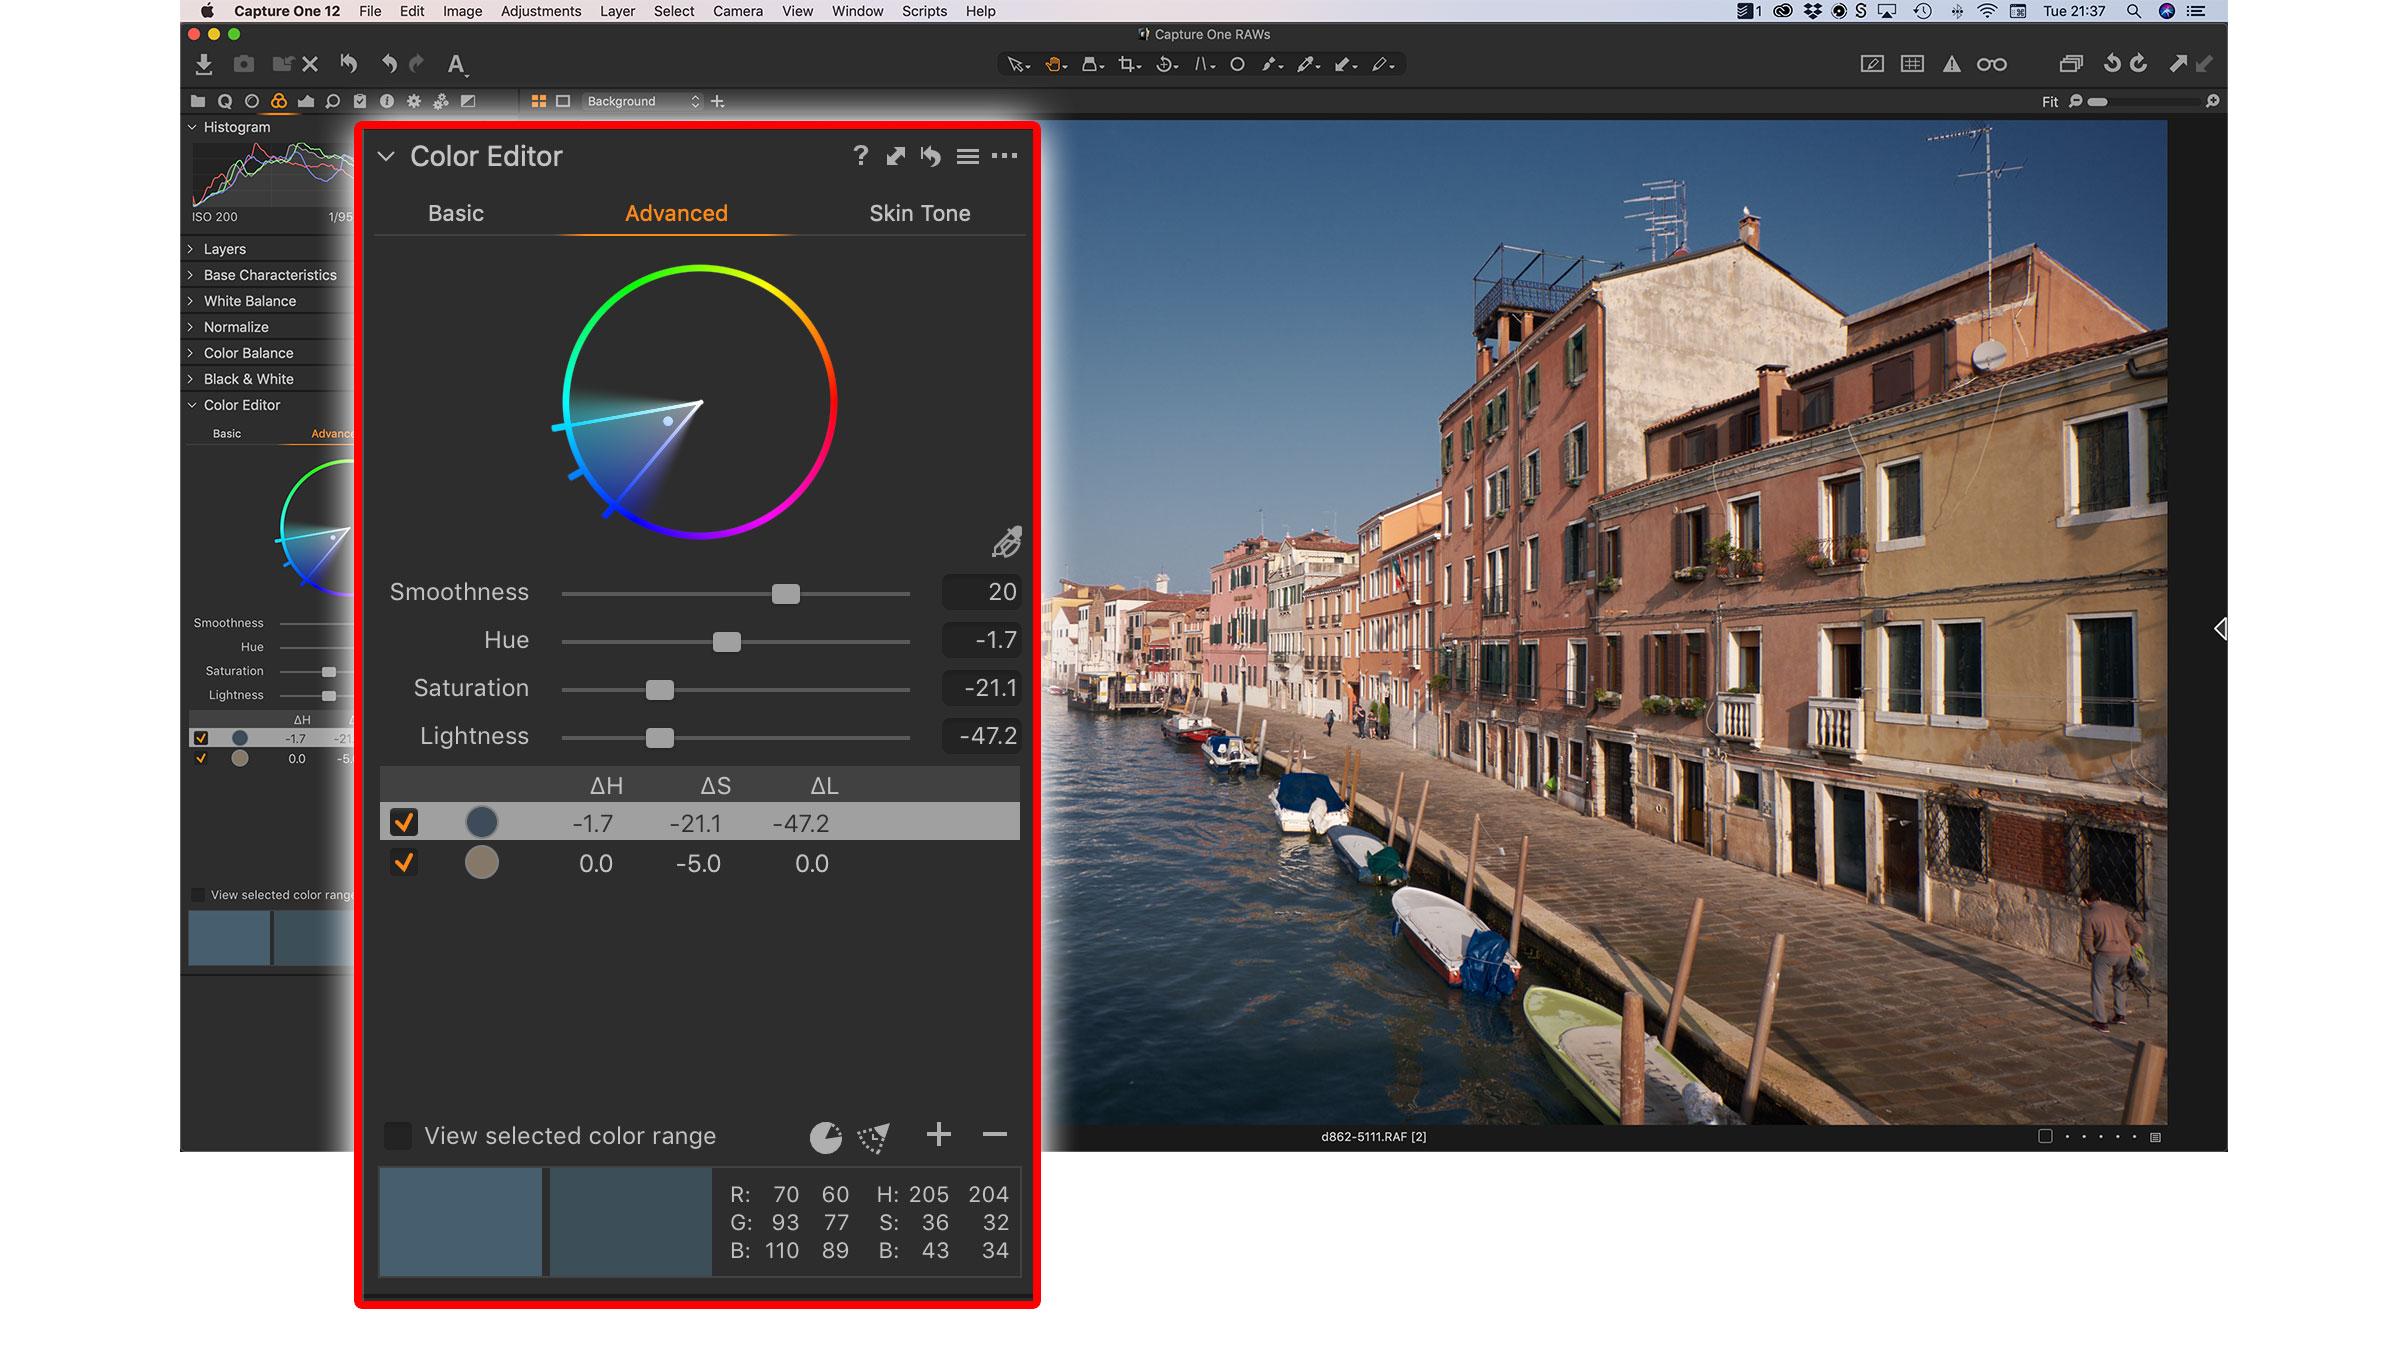 Capture One preset: SN-04 Seasonal Style